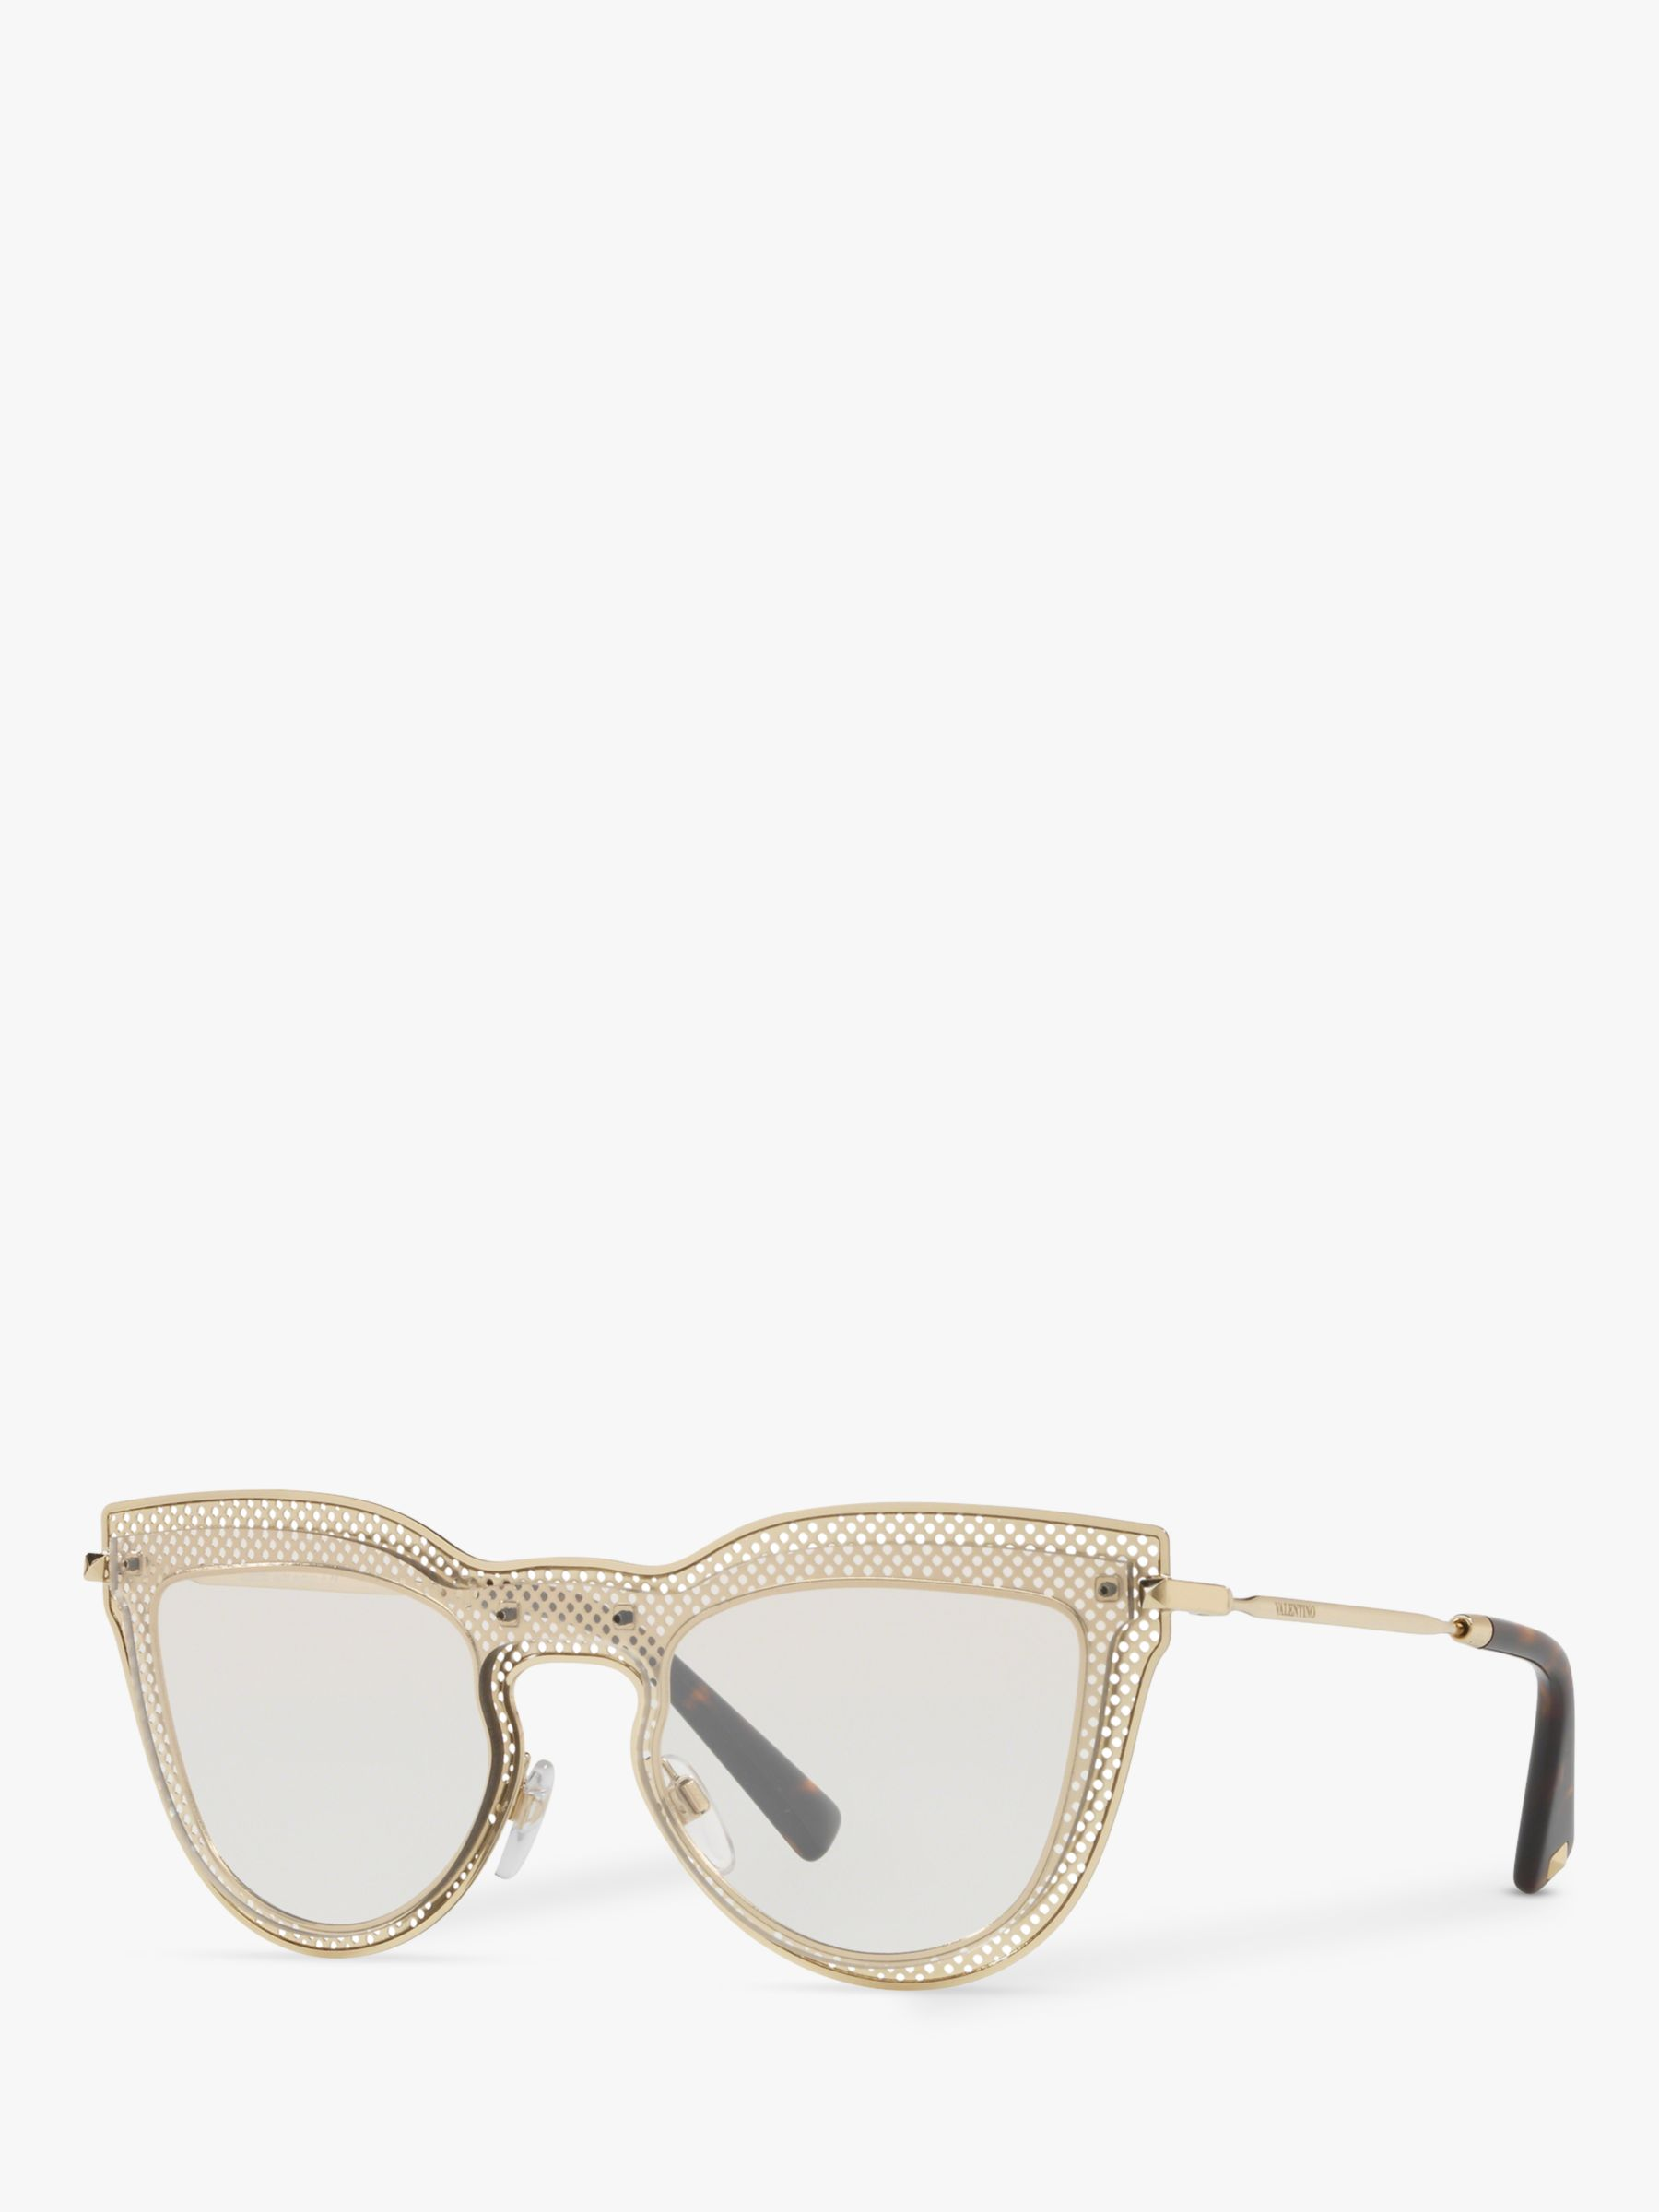 Valentino Valentino VA2018 Women's Cut Out Cat's Eye Sunglasses, Gold/Silver